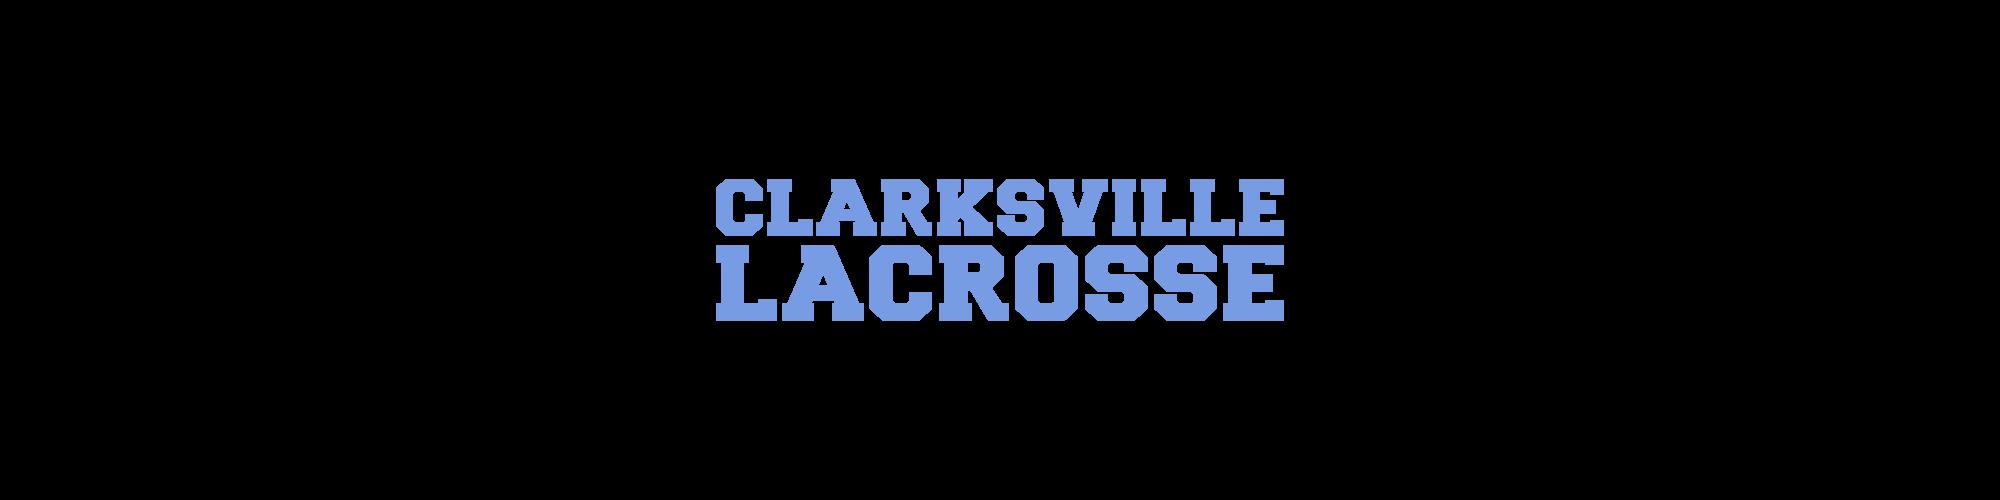 Clarksville Lacrosse